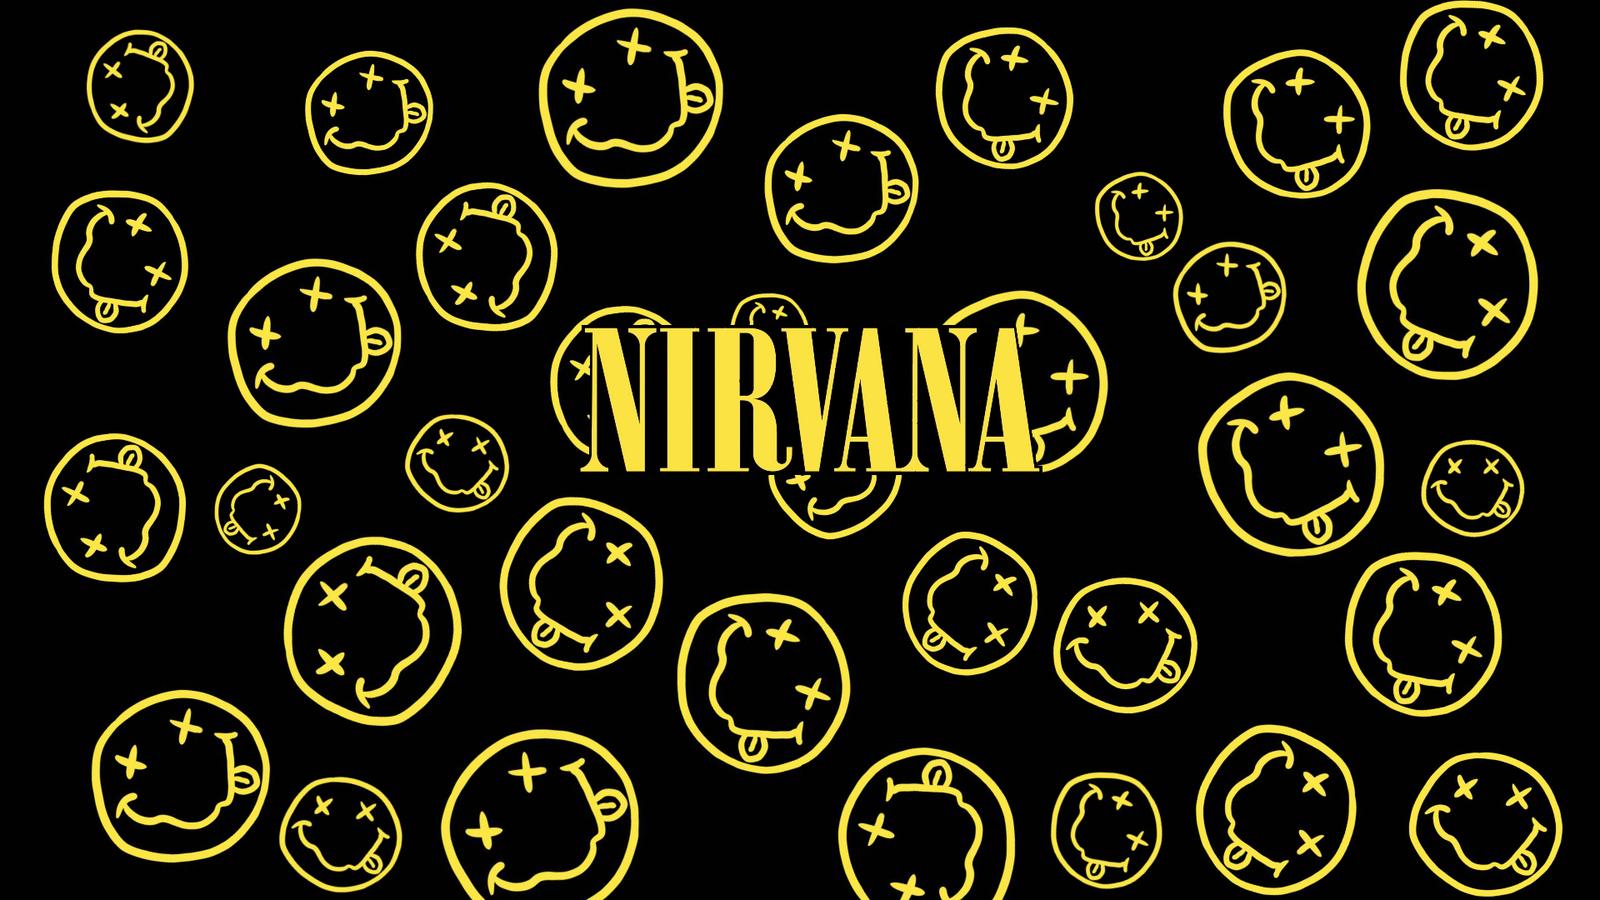 Nirvana Logo Wallpapers Wallpaper